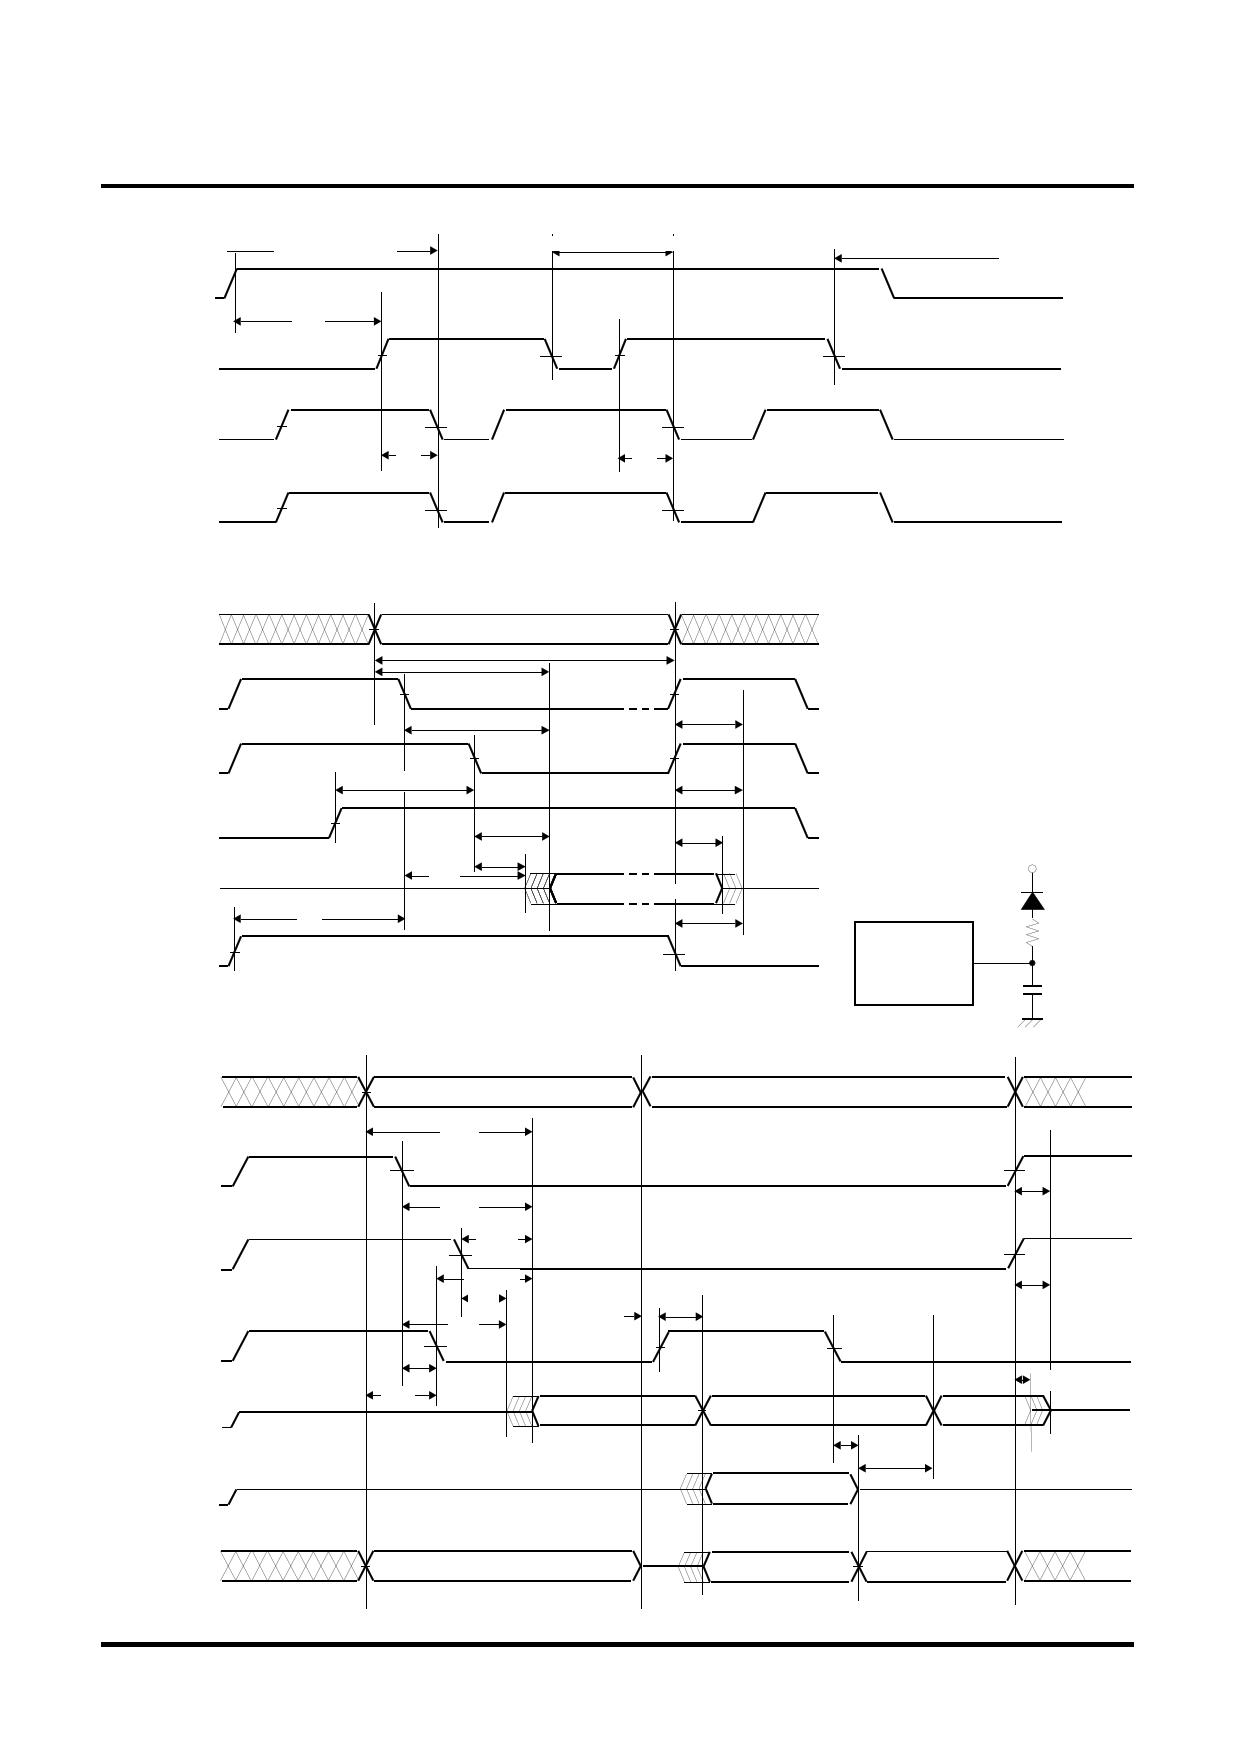 M5M29FT800VP-10 diode, scr